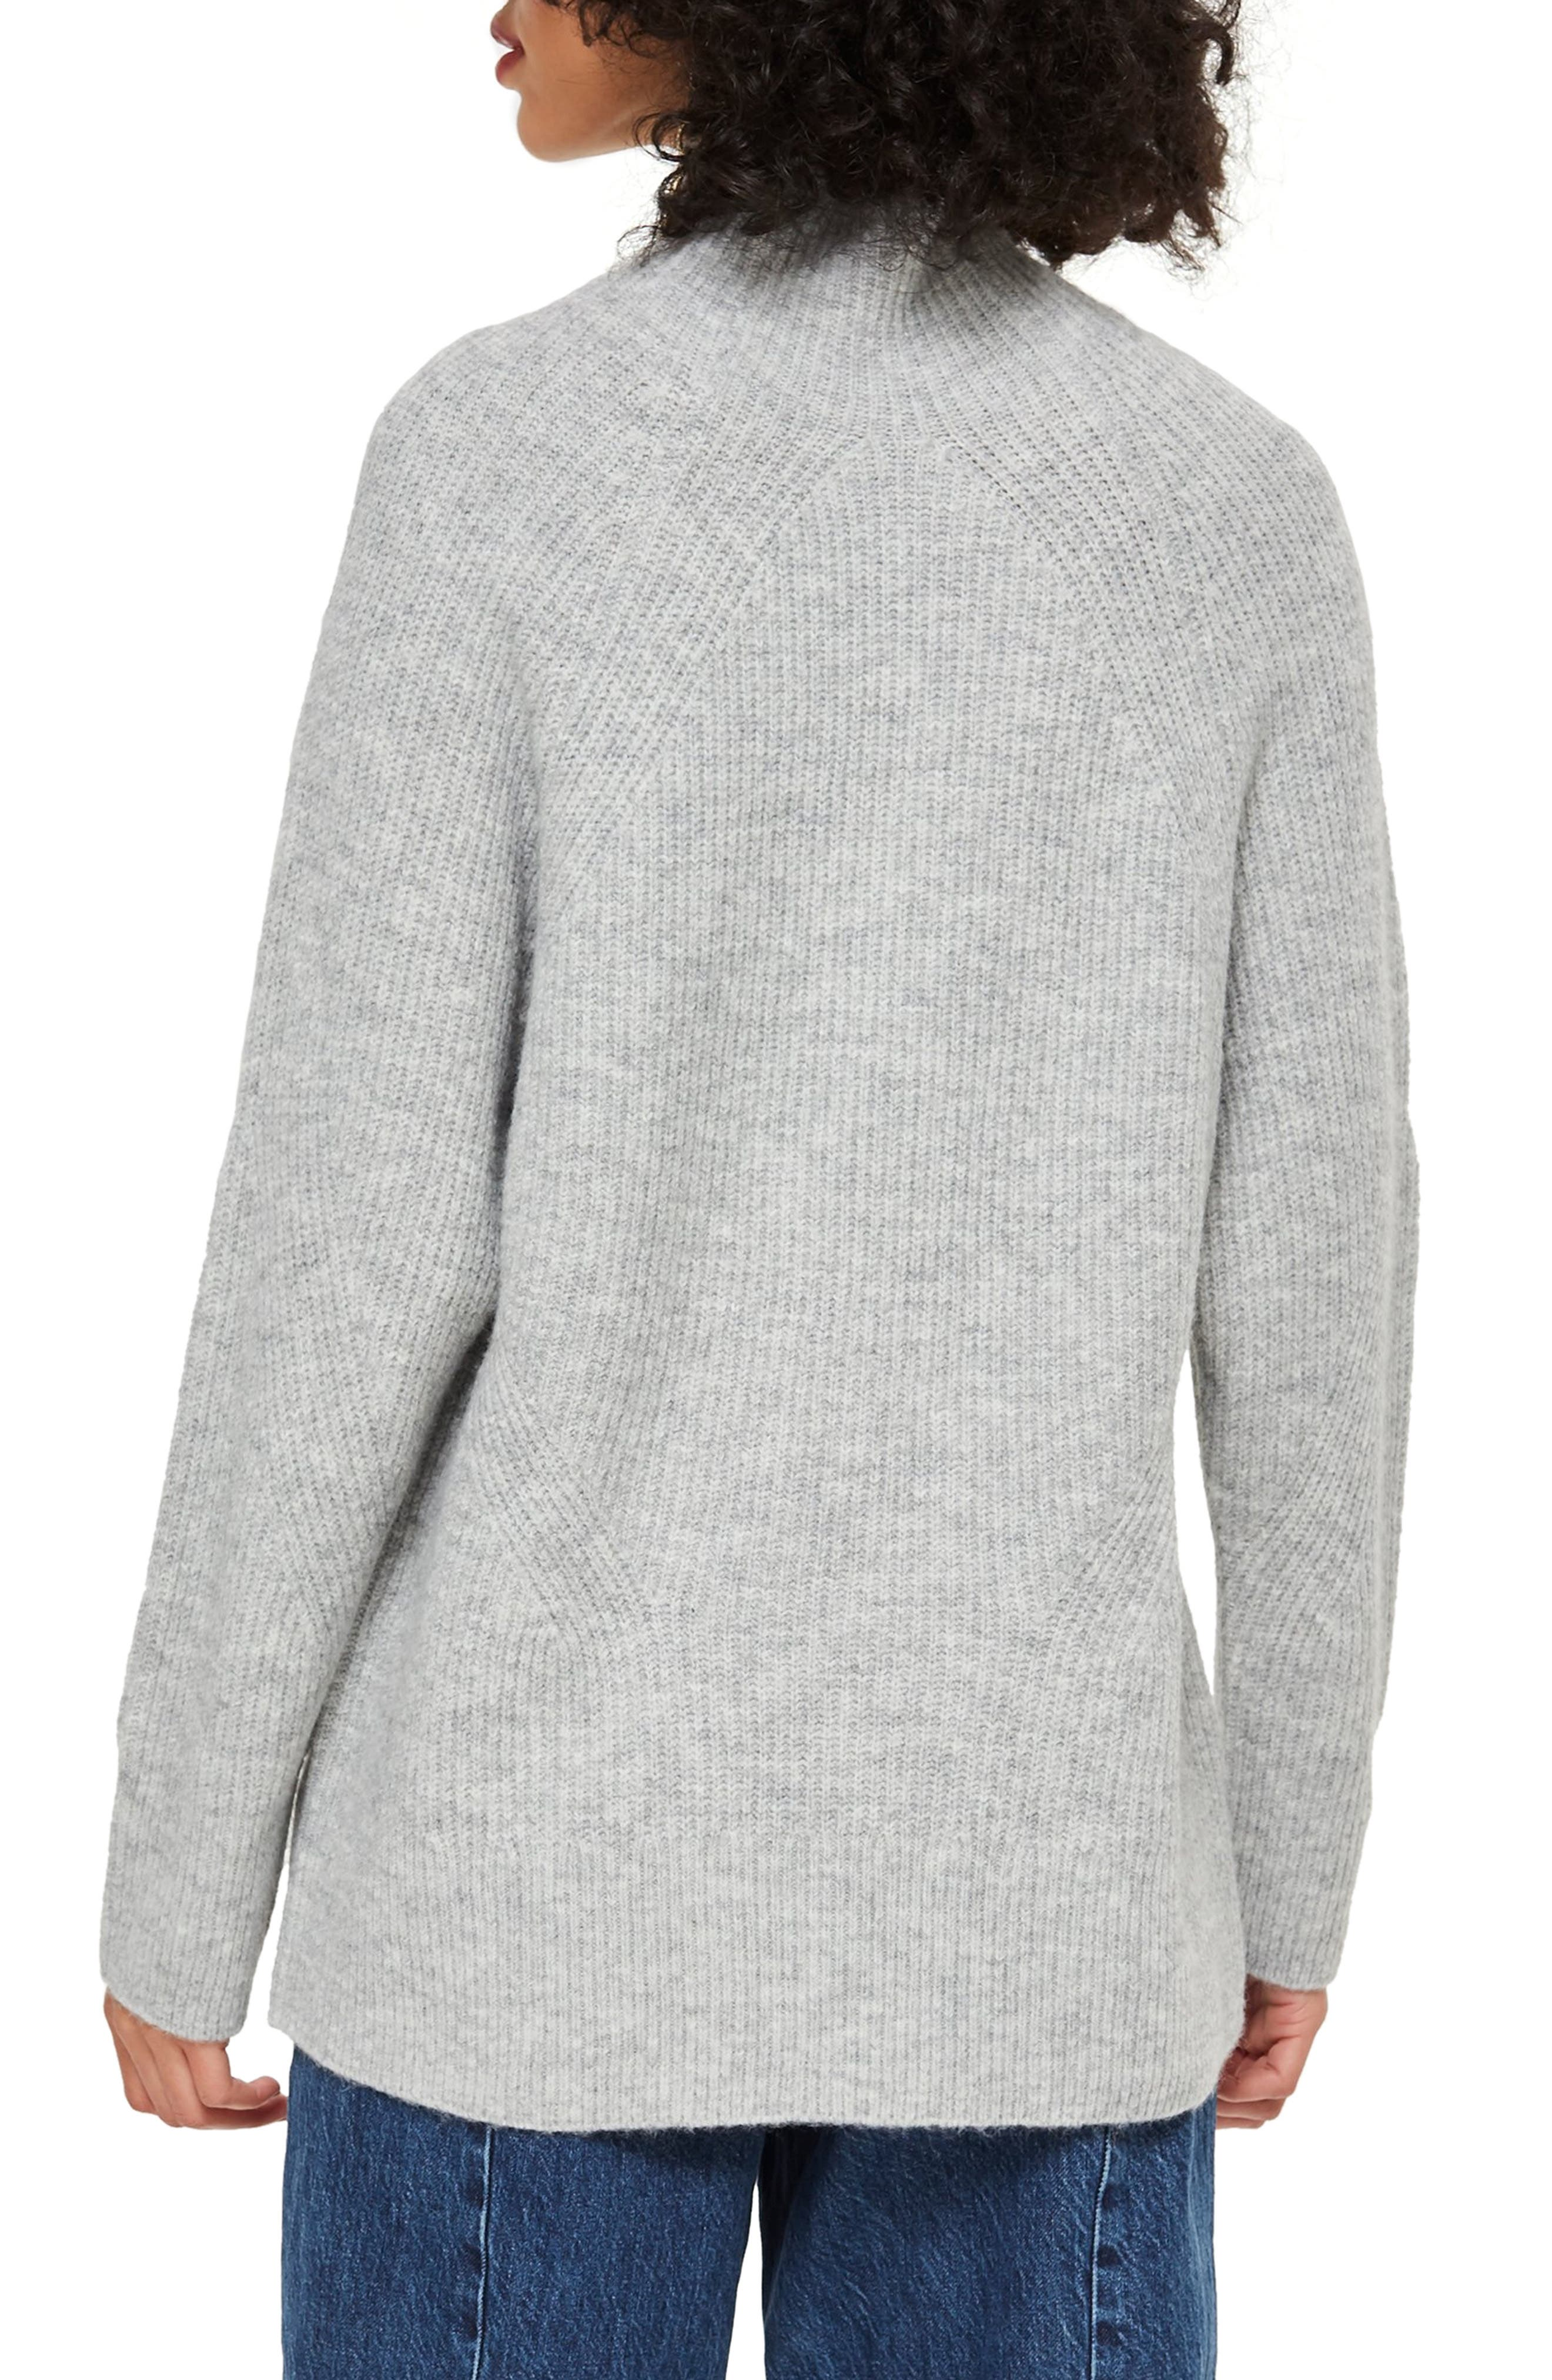 Raglan Turtleneck Neck Sweater,                             Alternate thumbnail 2, color,                             GREY MARL